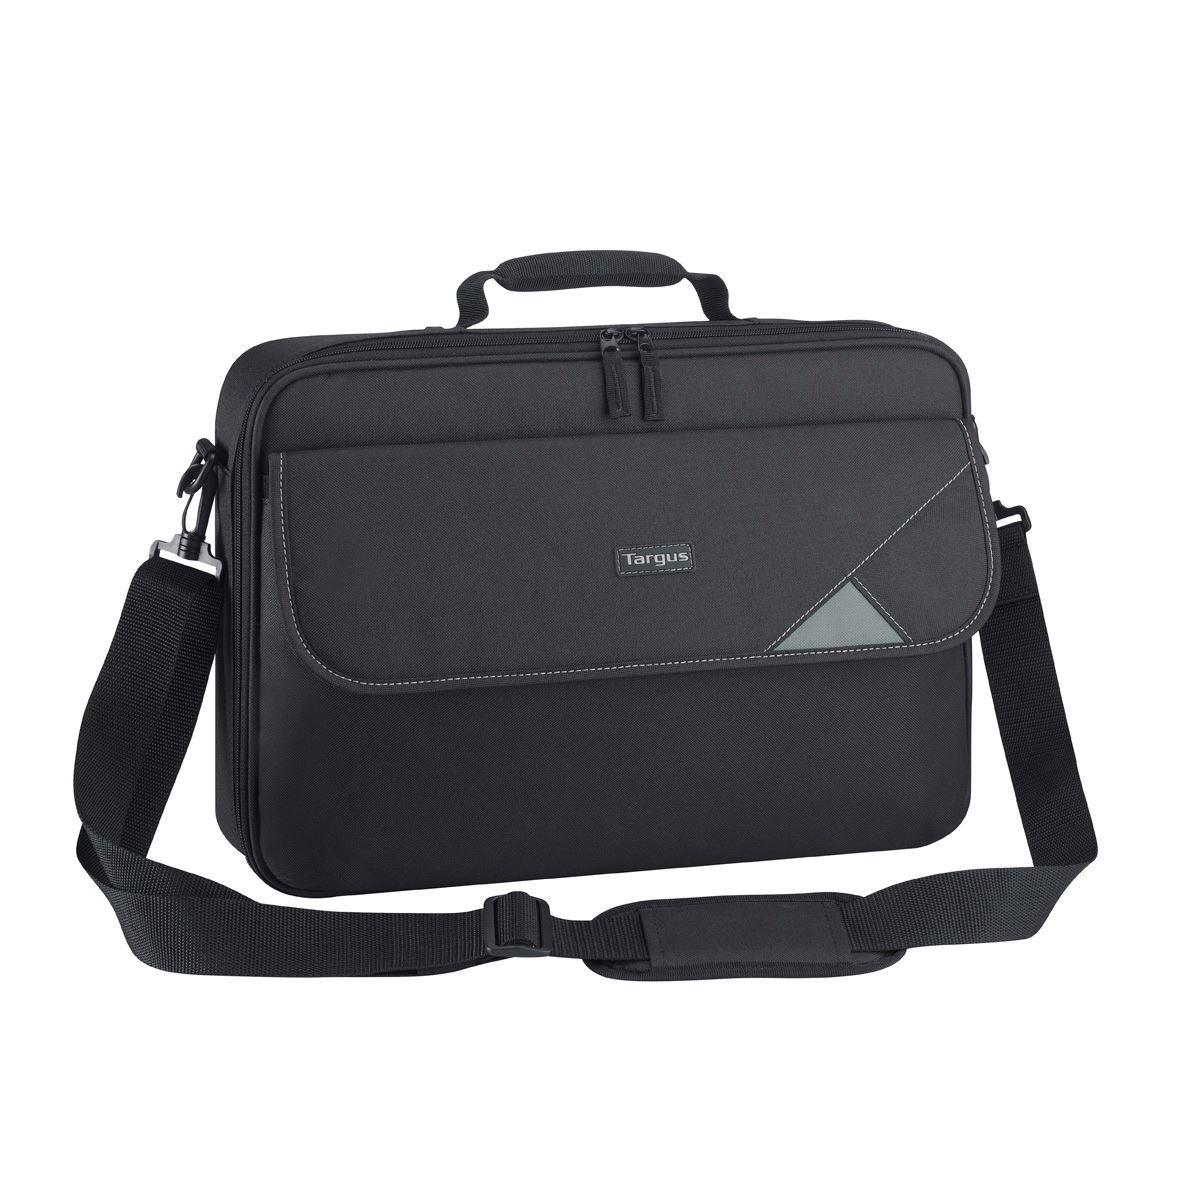 Olkalaukku Tablet : Intellect clamshell sacoche pour ordinateur portable